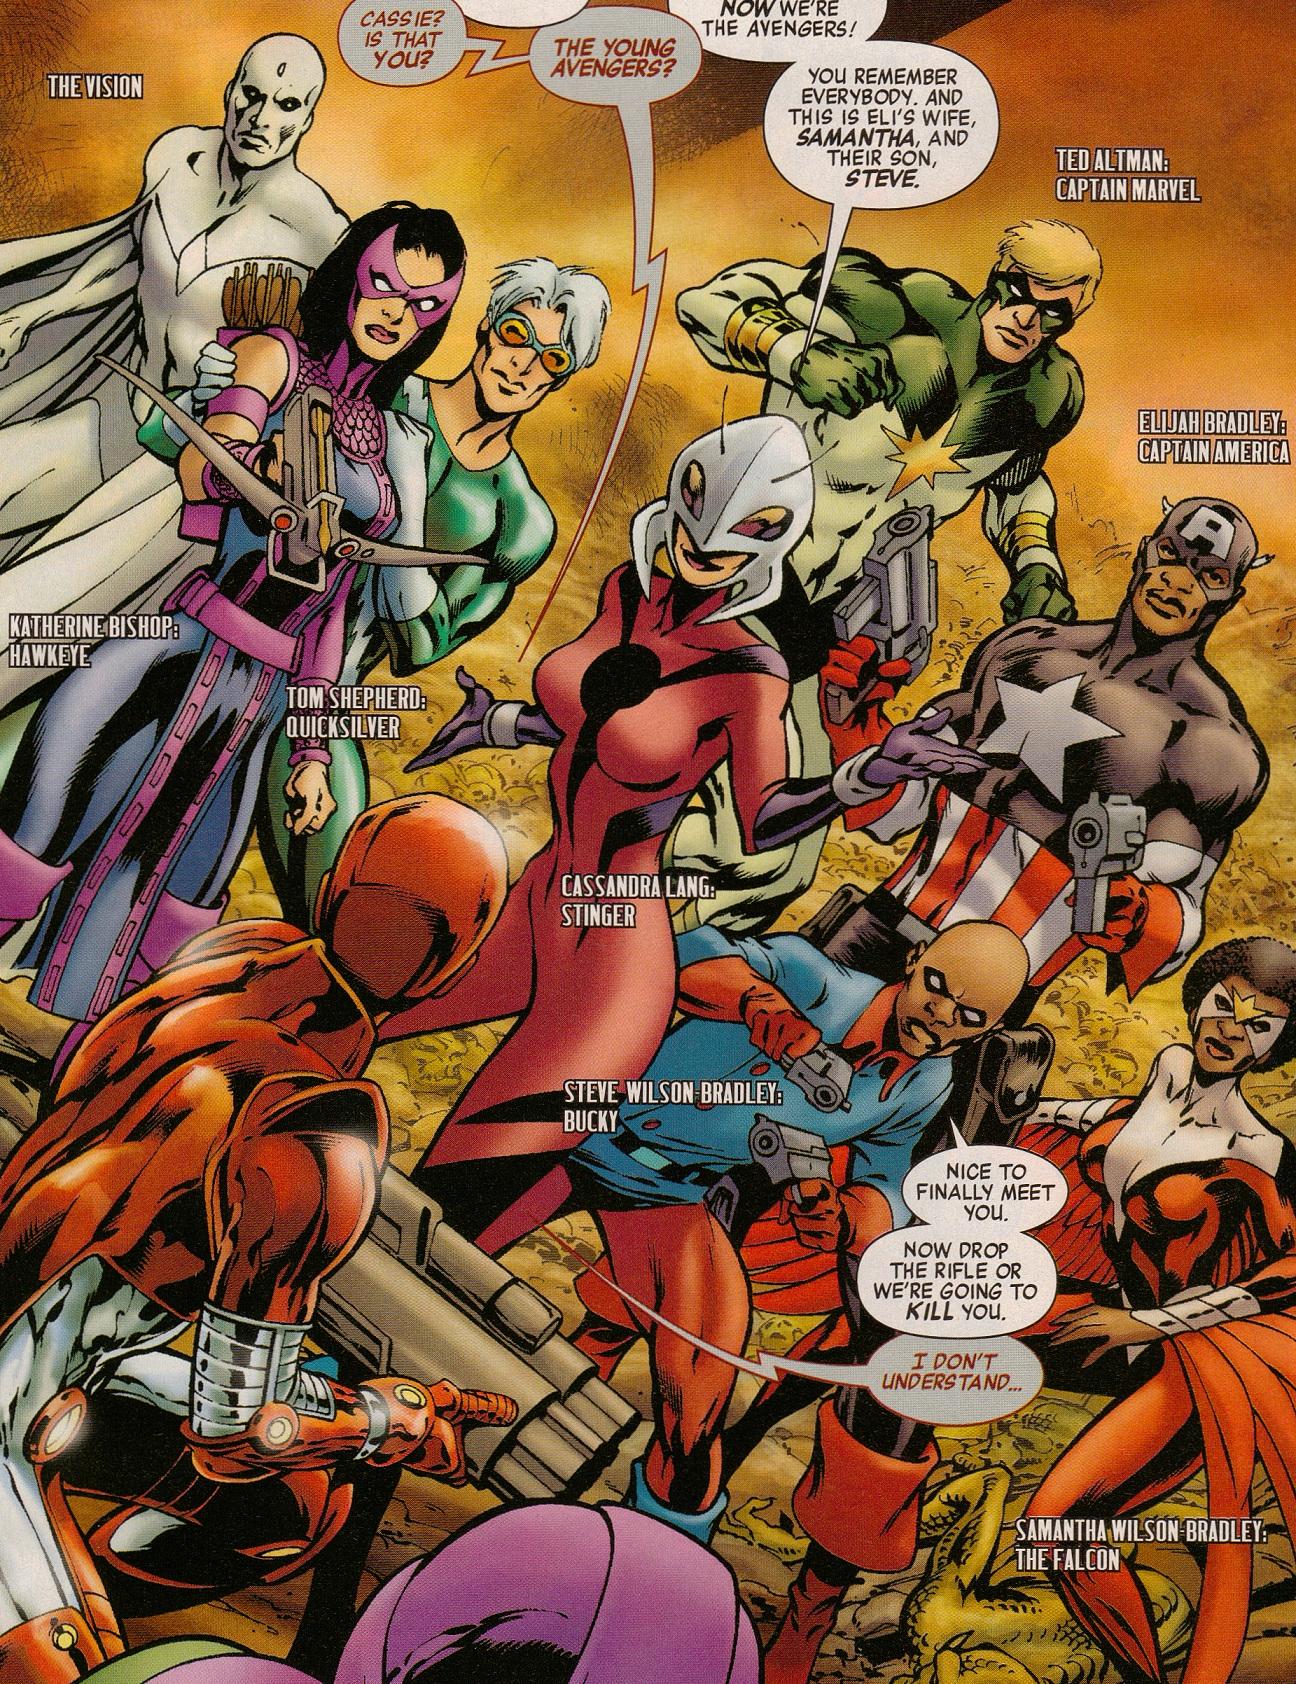 Avengers (Earth-11051) from Avengers The Children's Crusade - Young Avengers Vol 1 1 0001.jpg